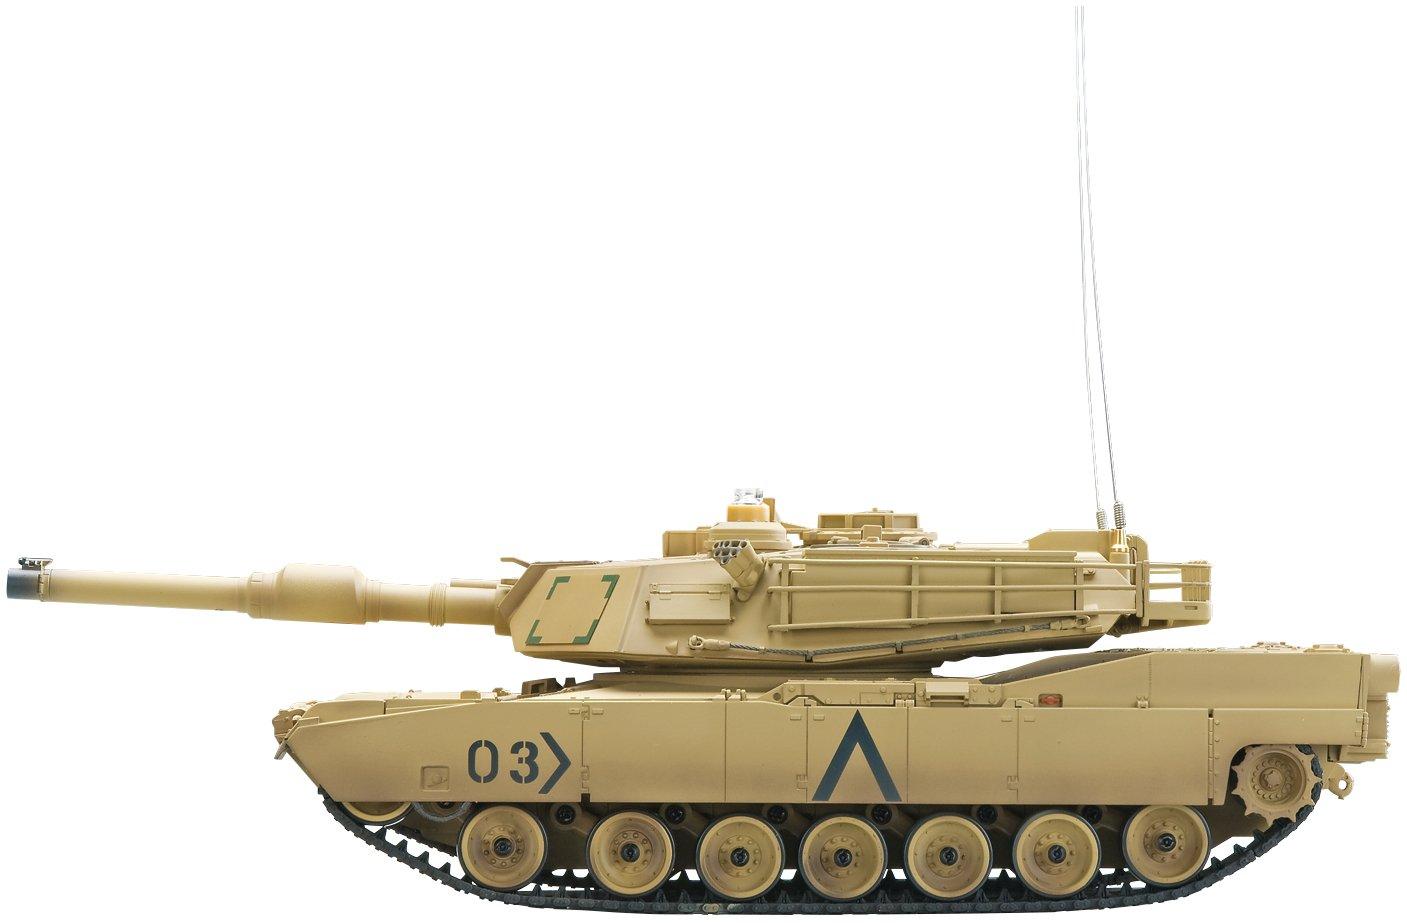 abrams tank vs tiger - photo #5